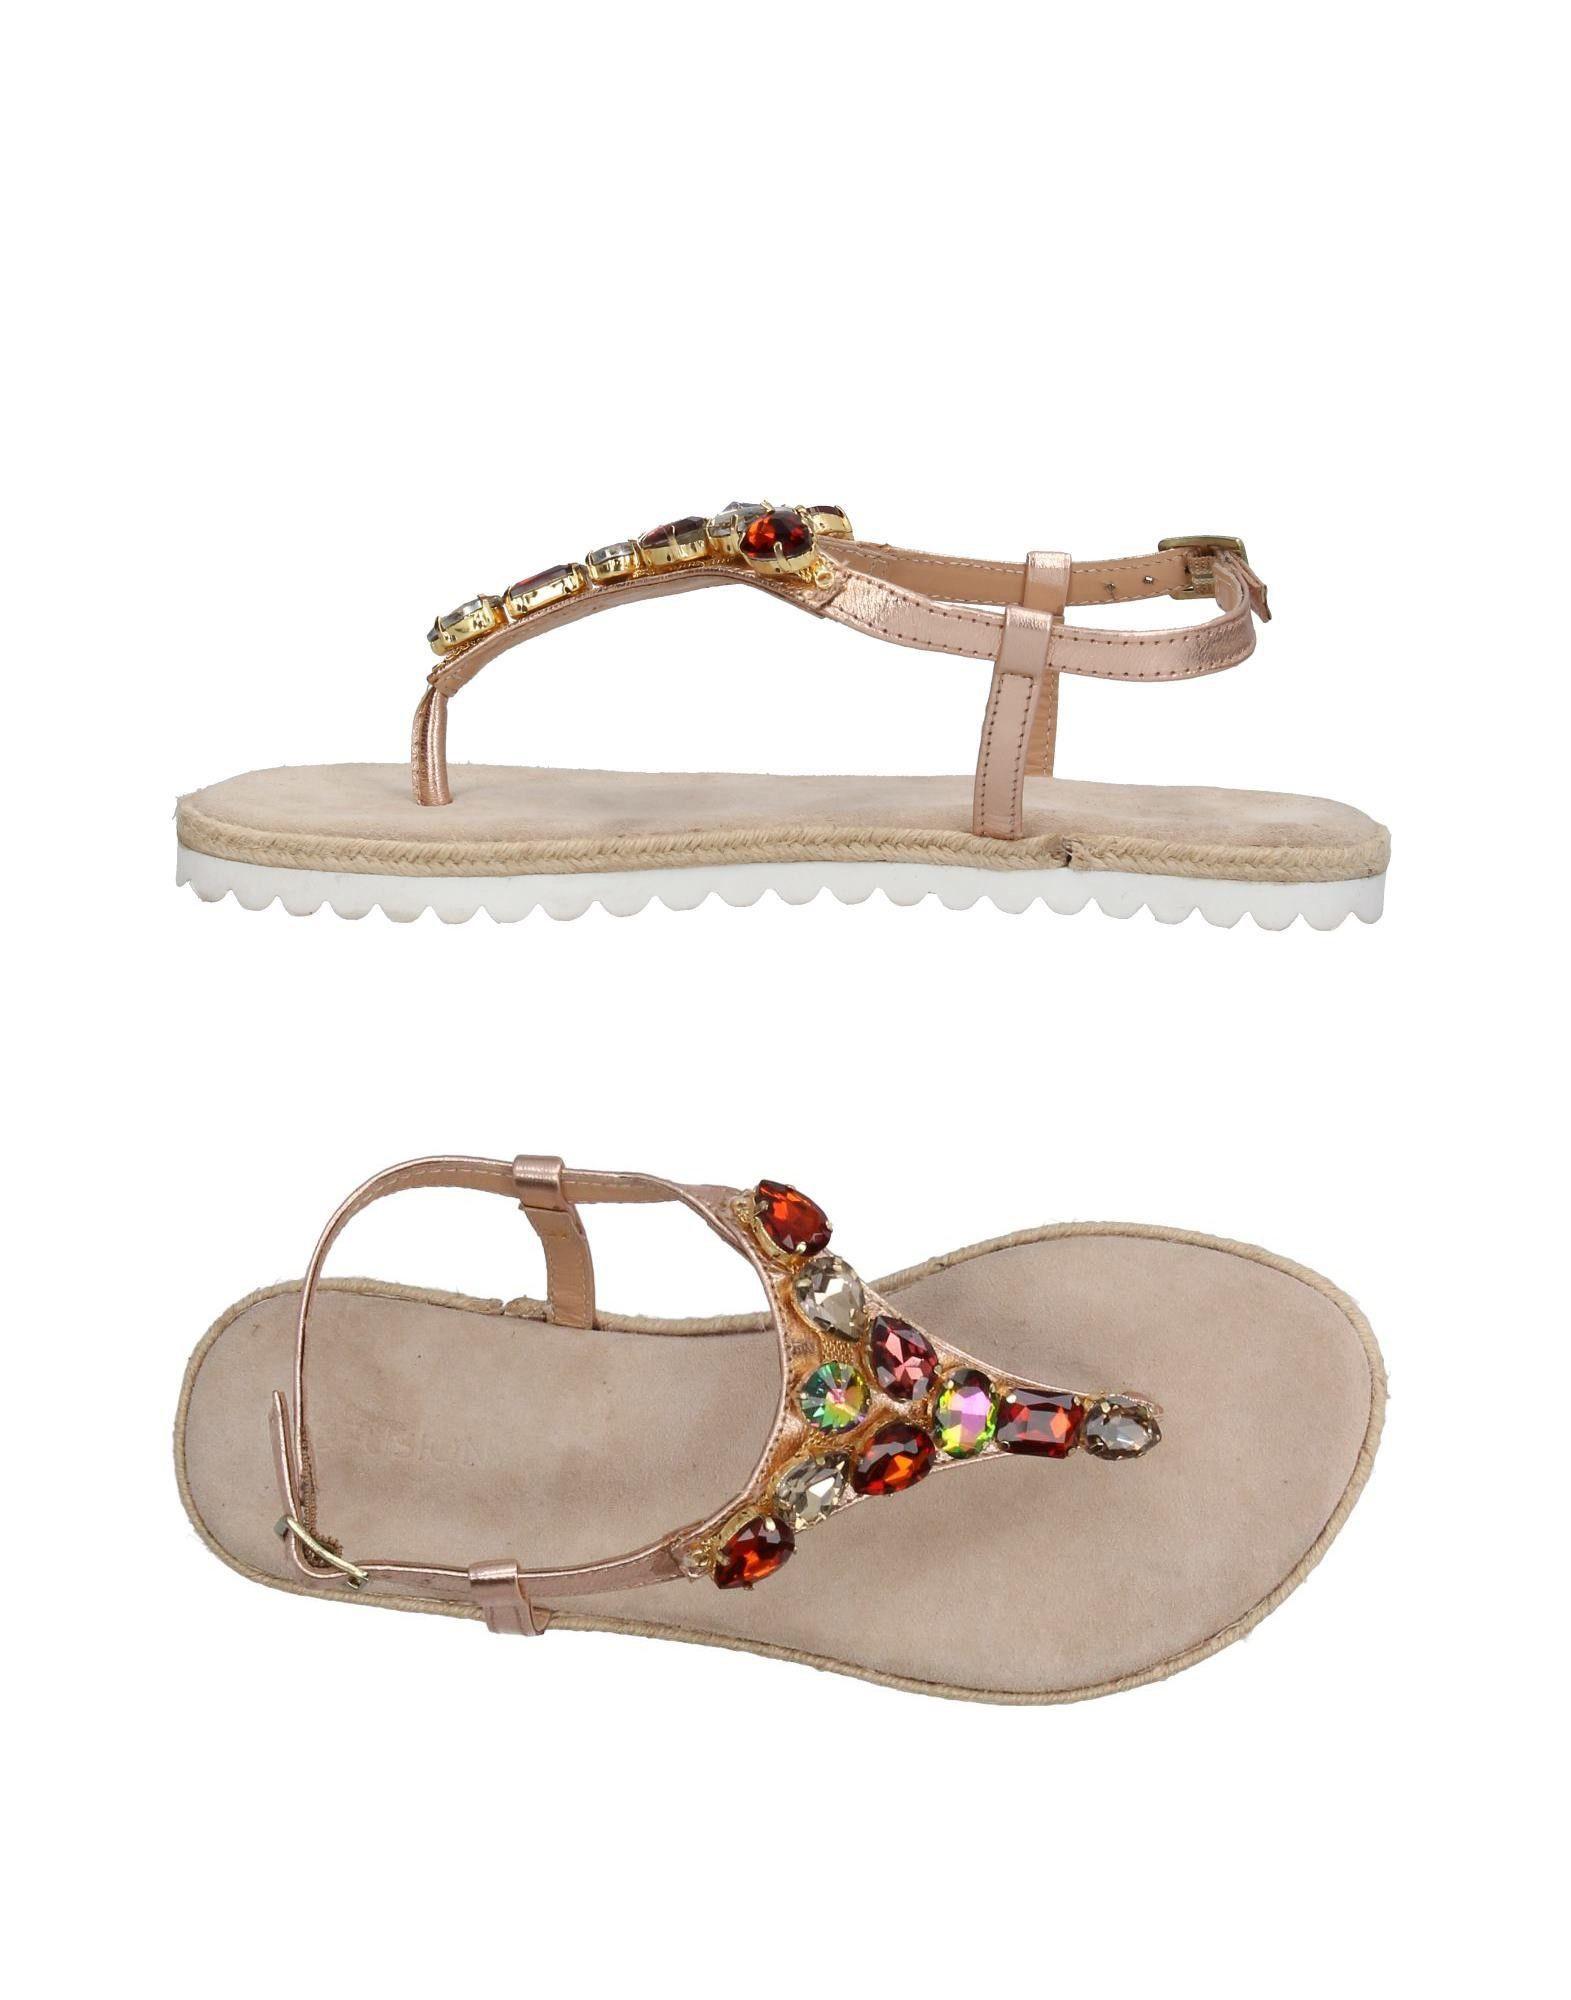 Cb Fusion Dianetten Damen  11385322MR Gute Qualität beliebte Schuhe